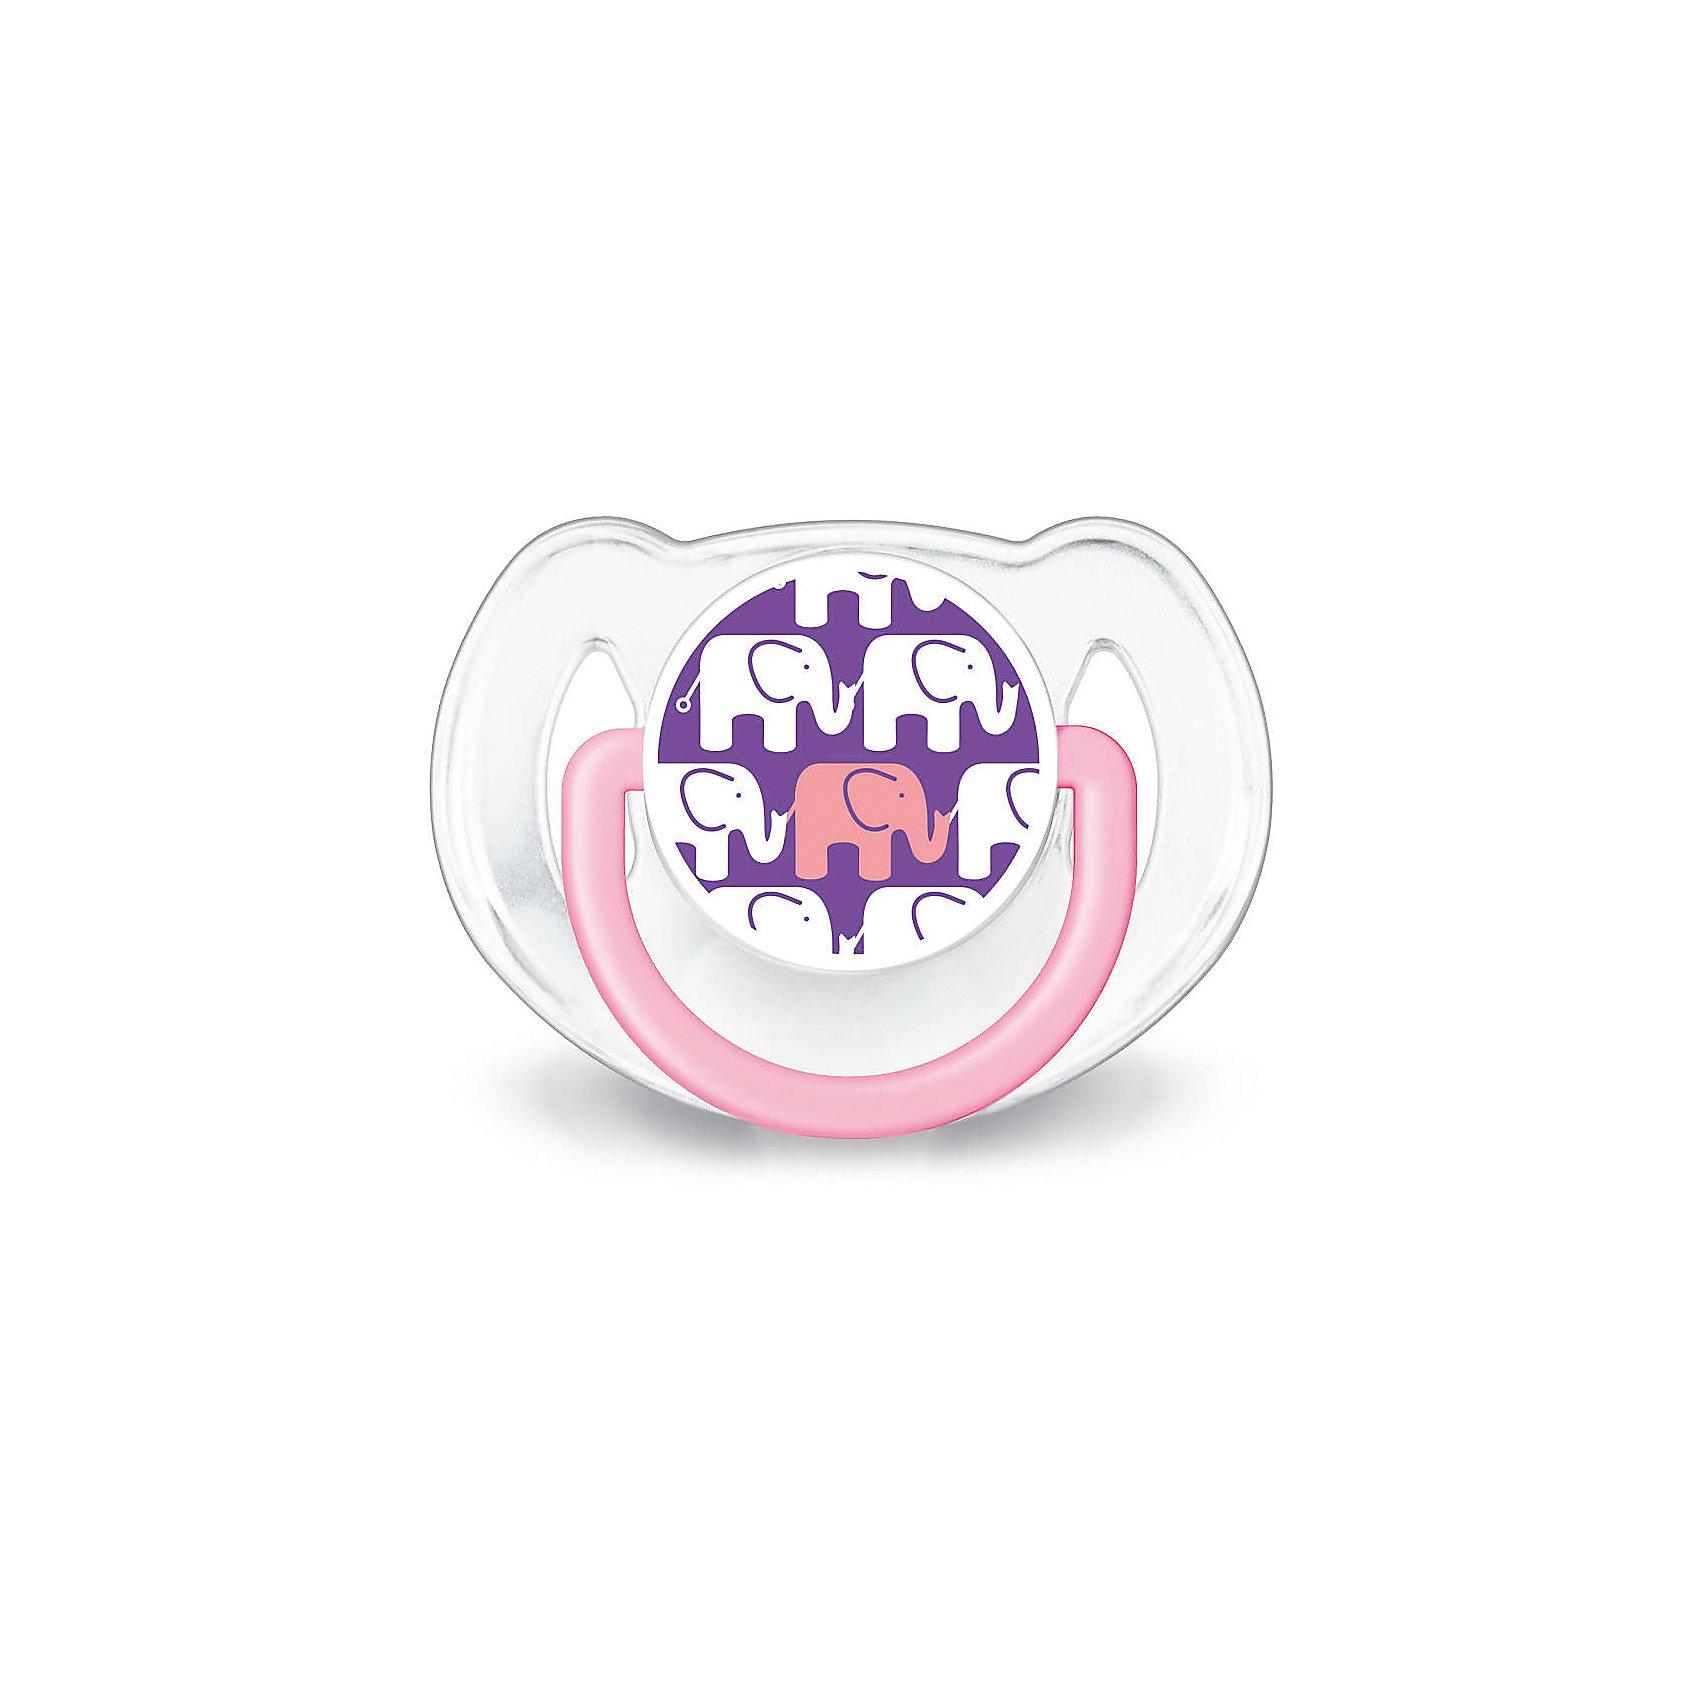 Соска-пустышка 6-18 мес, 2 шт, Дизайн, Philips Avent, фиолетовый/белый